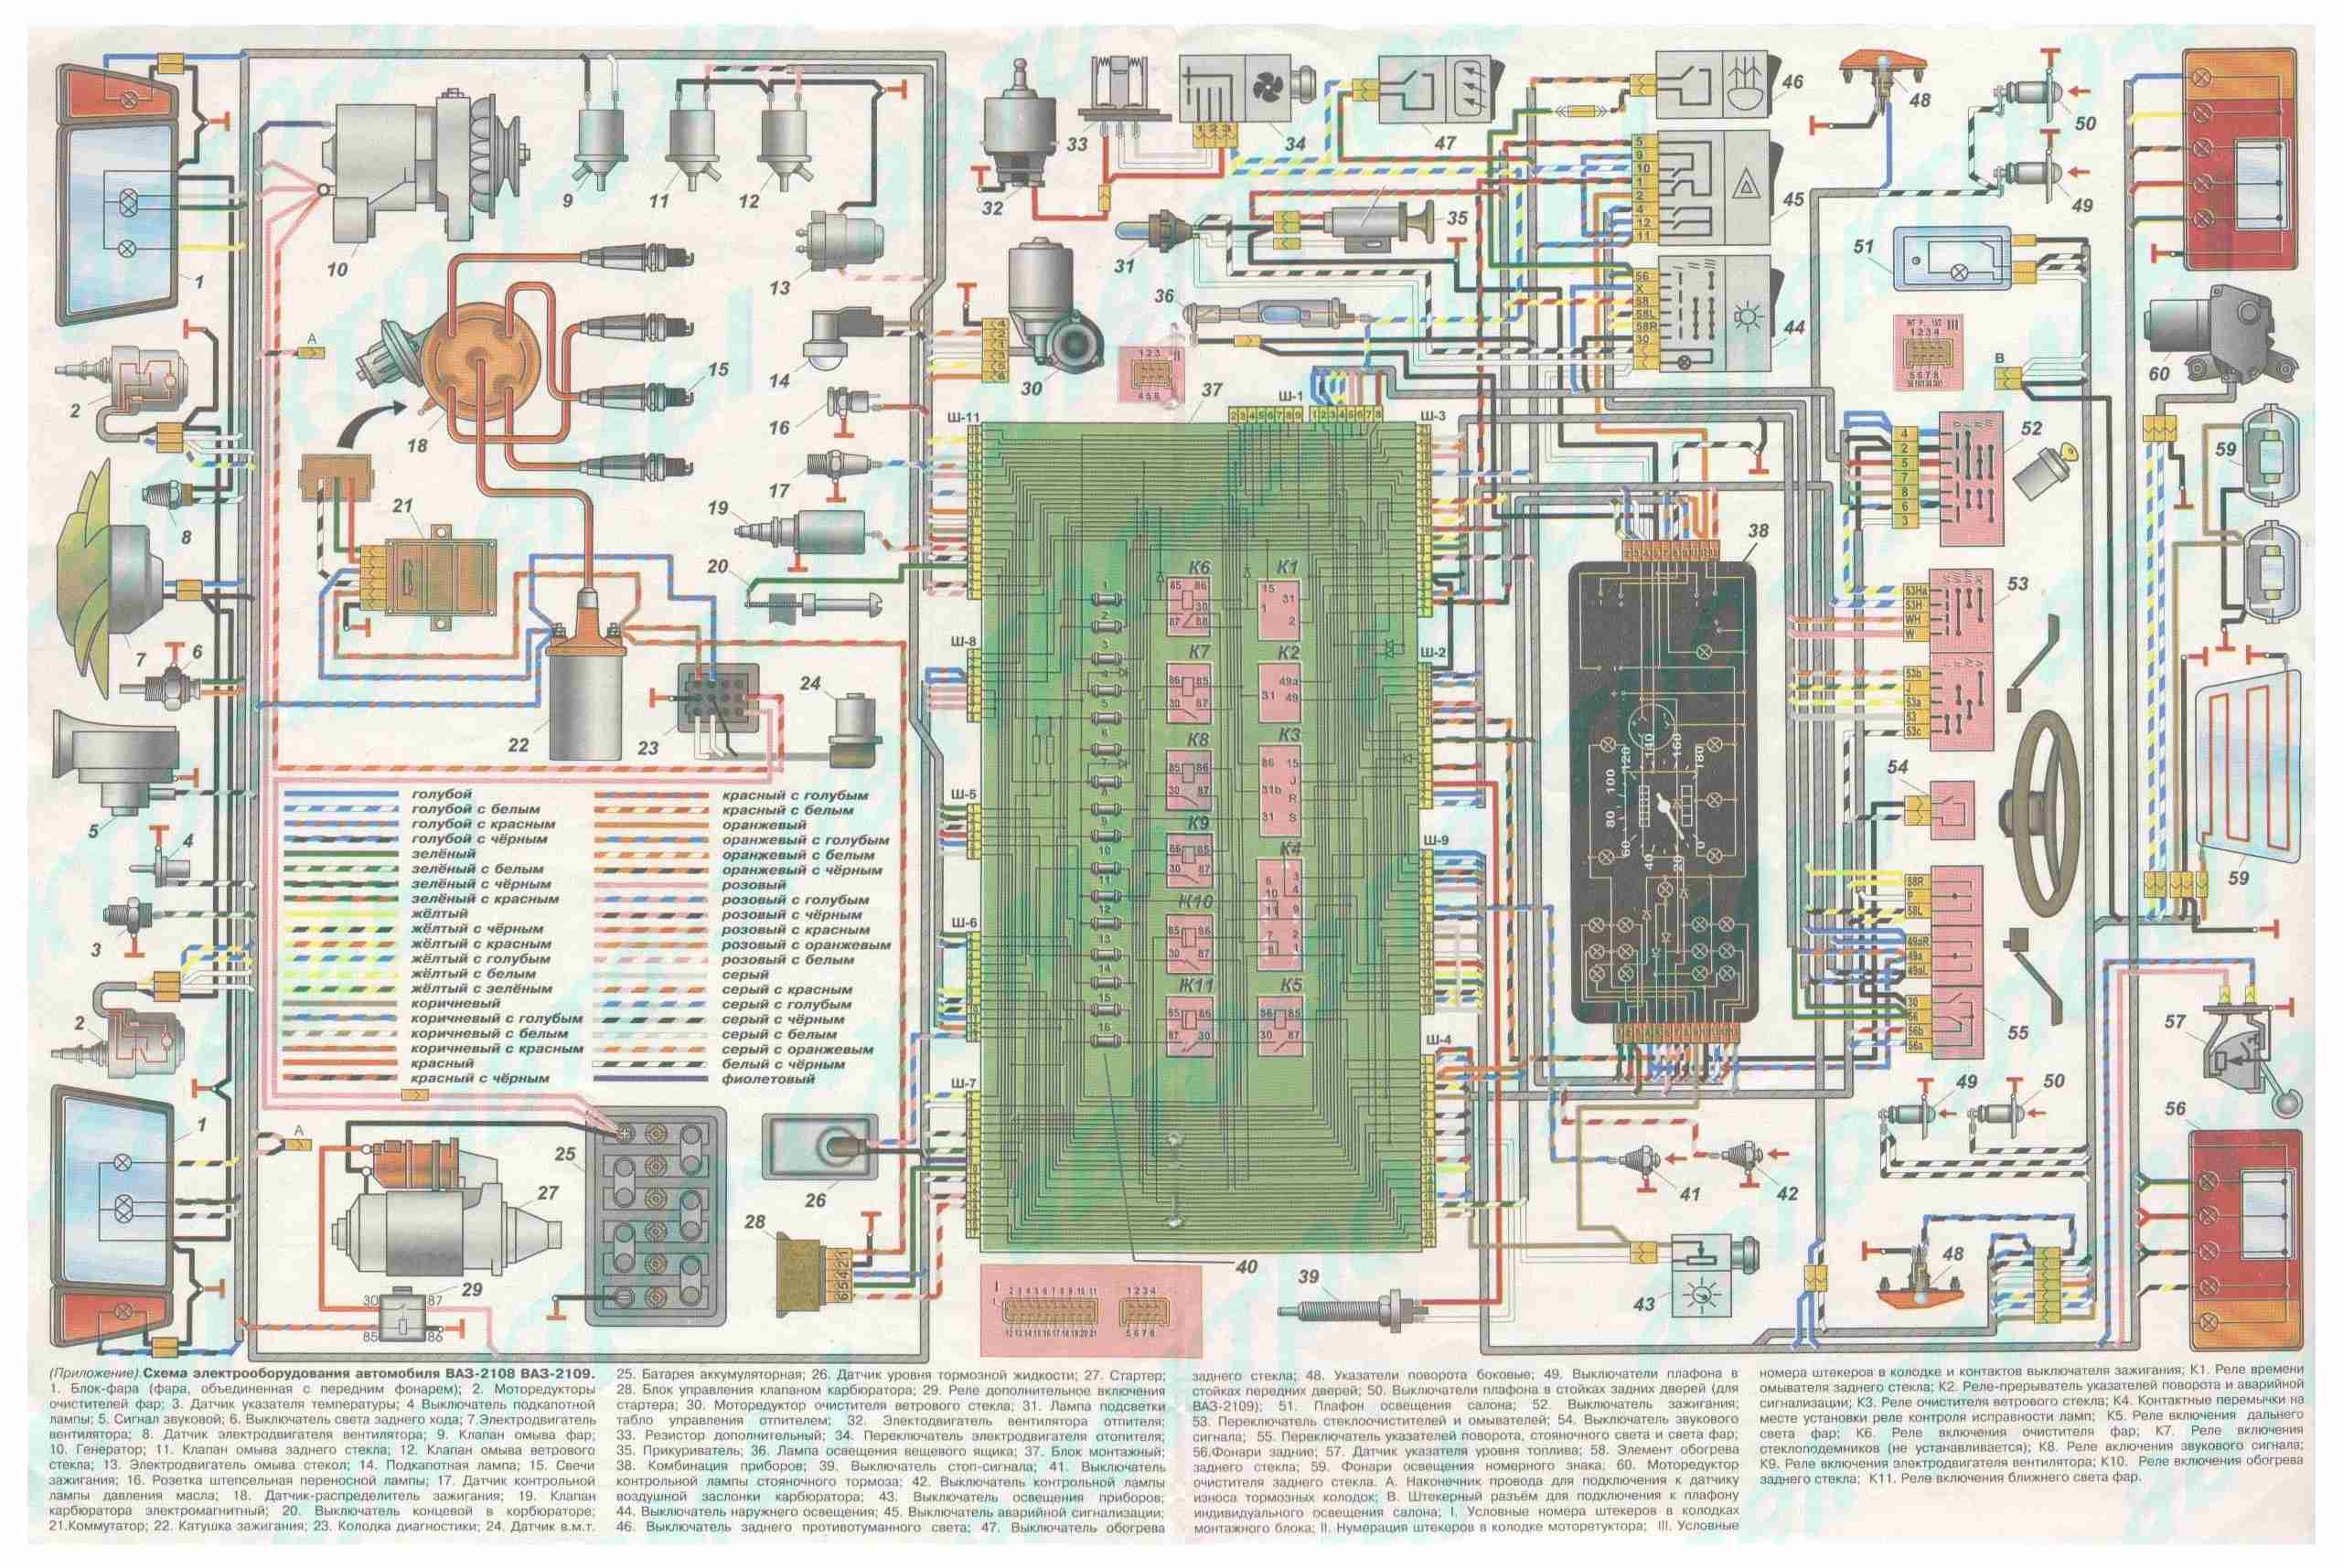 хонда срв 1997 руководство по эксплуатации